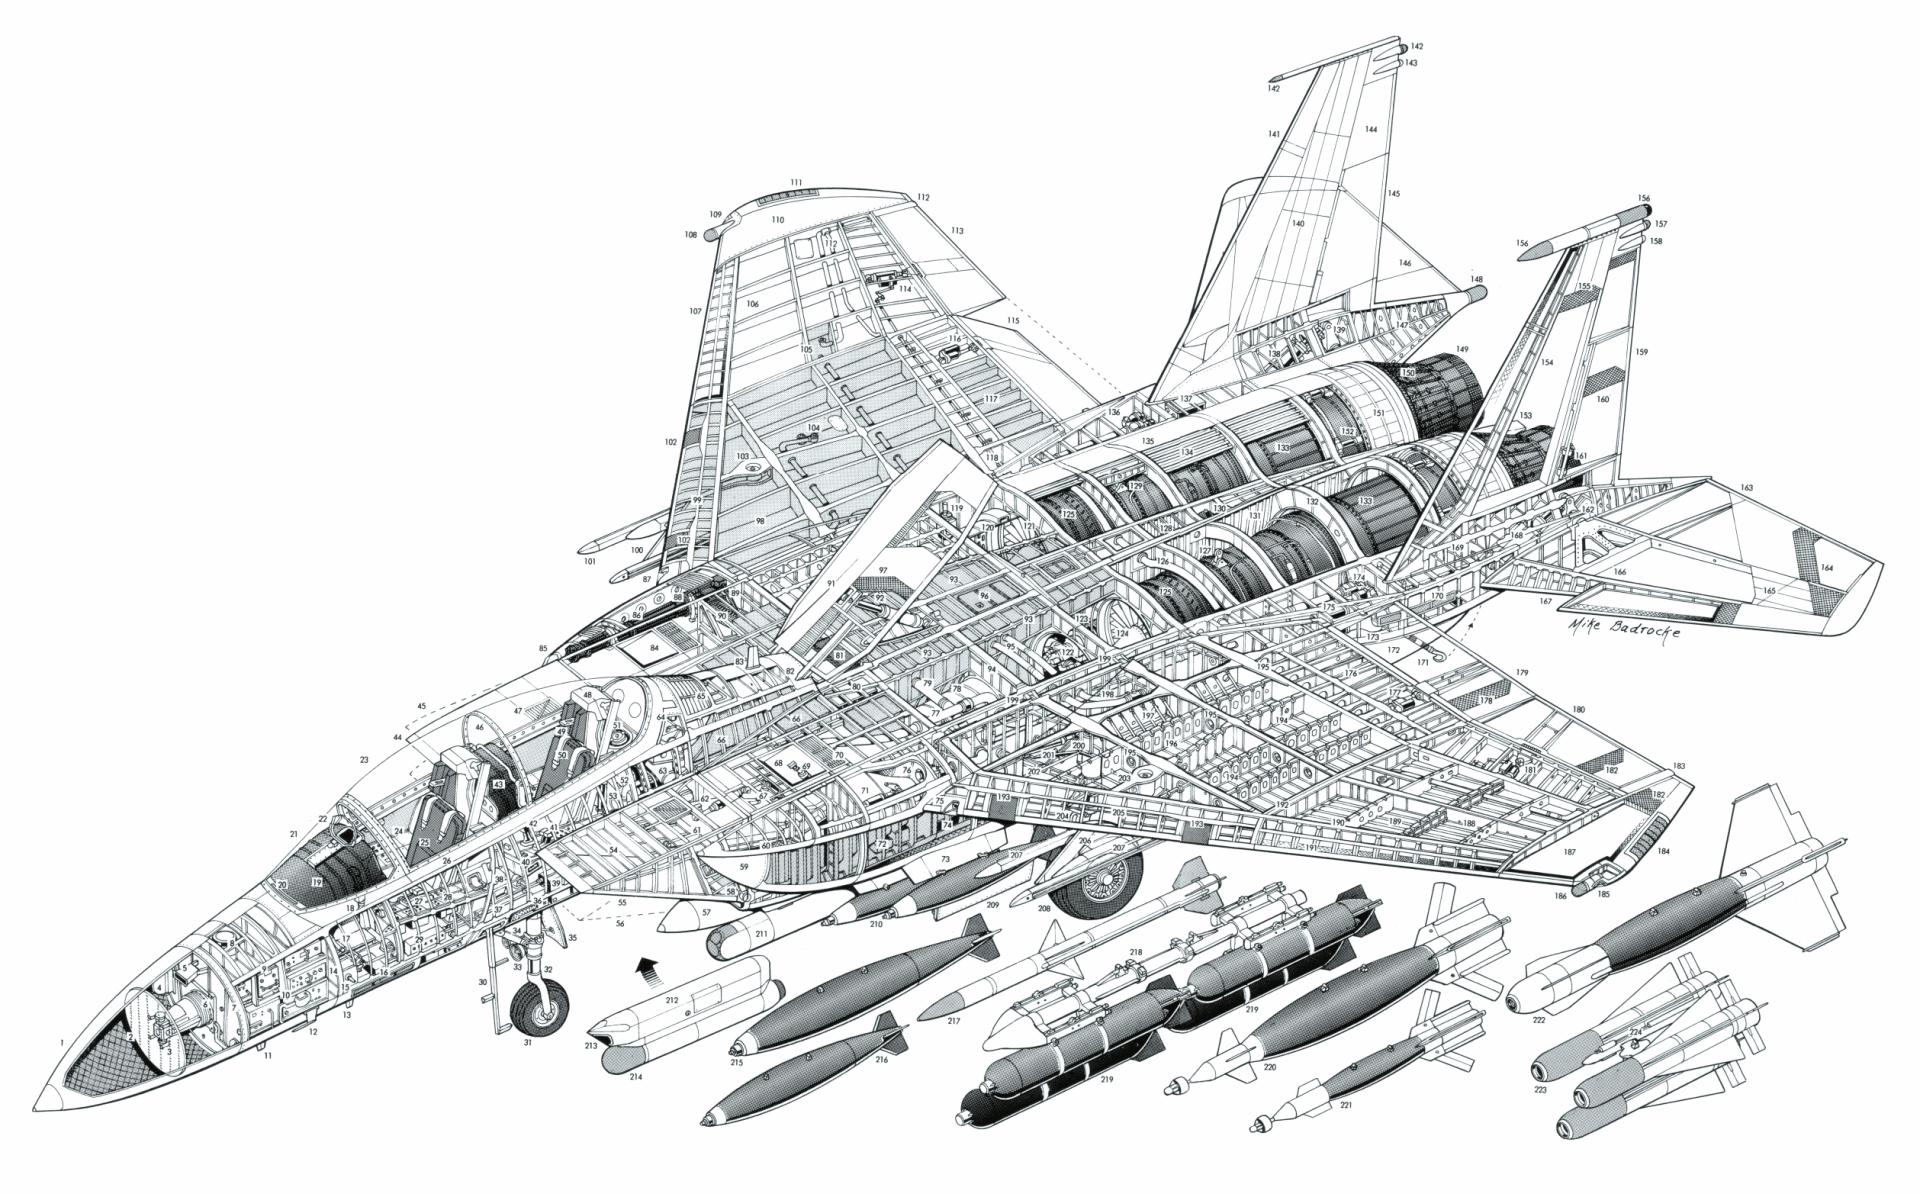 Military Schematic Aircraft McDonnell Douglas F-15E Strike Eagle Wallpaper  | Aircraft design, Airplane design, Vintage aircraftPinterest